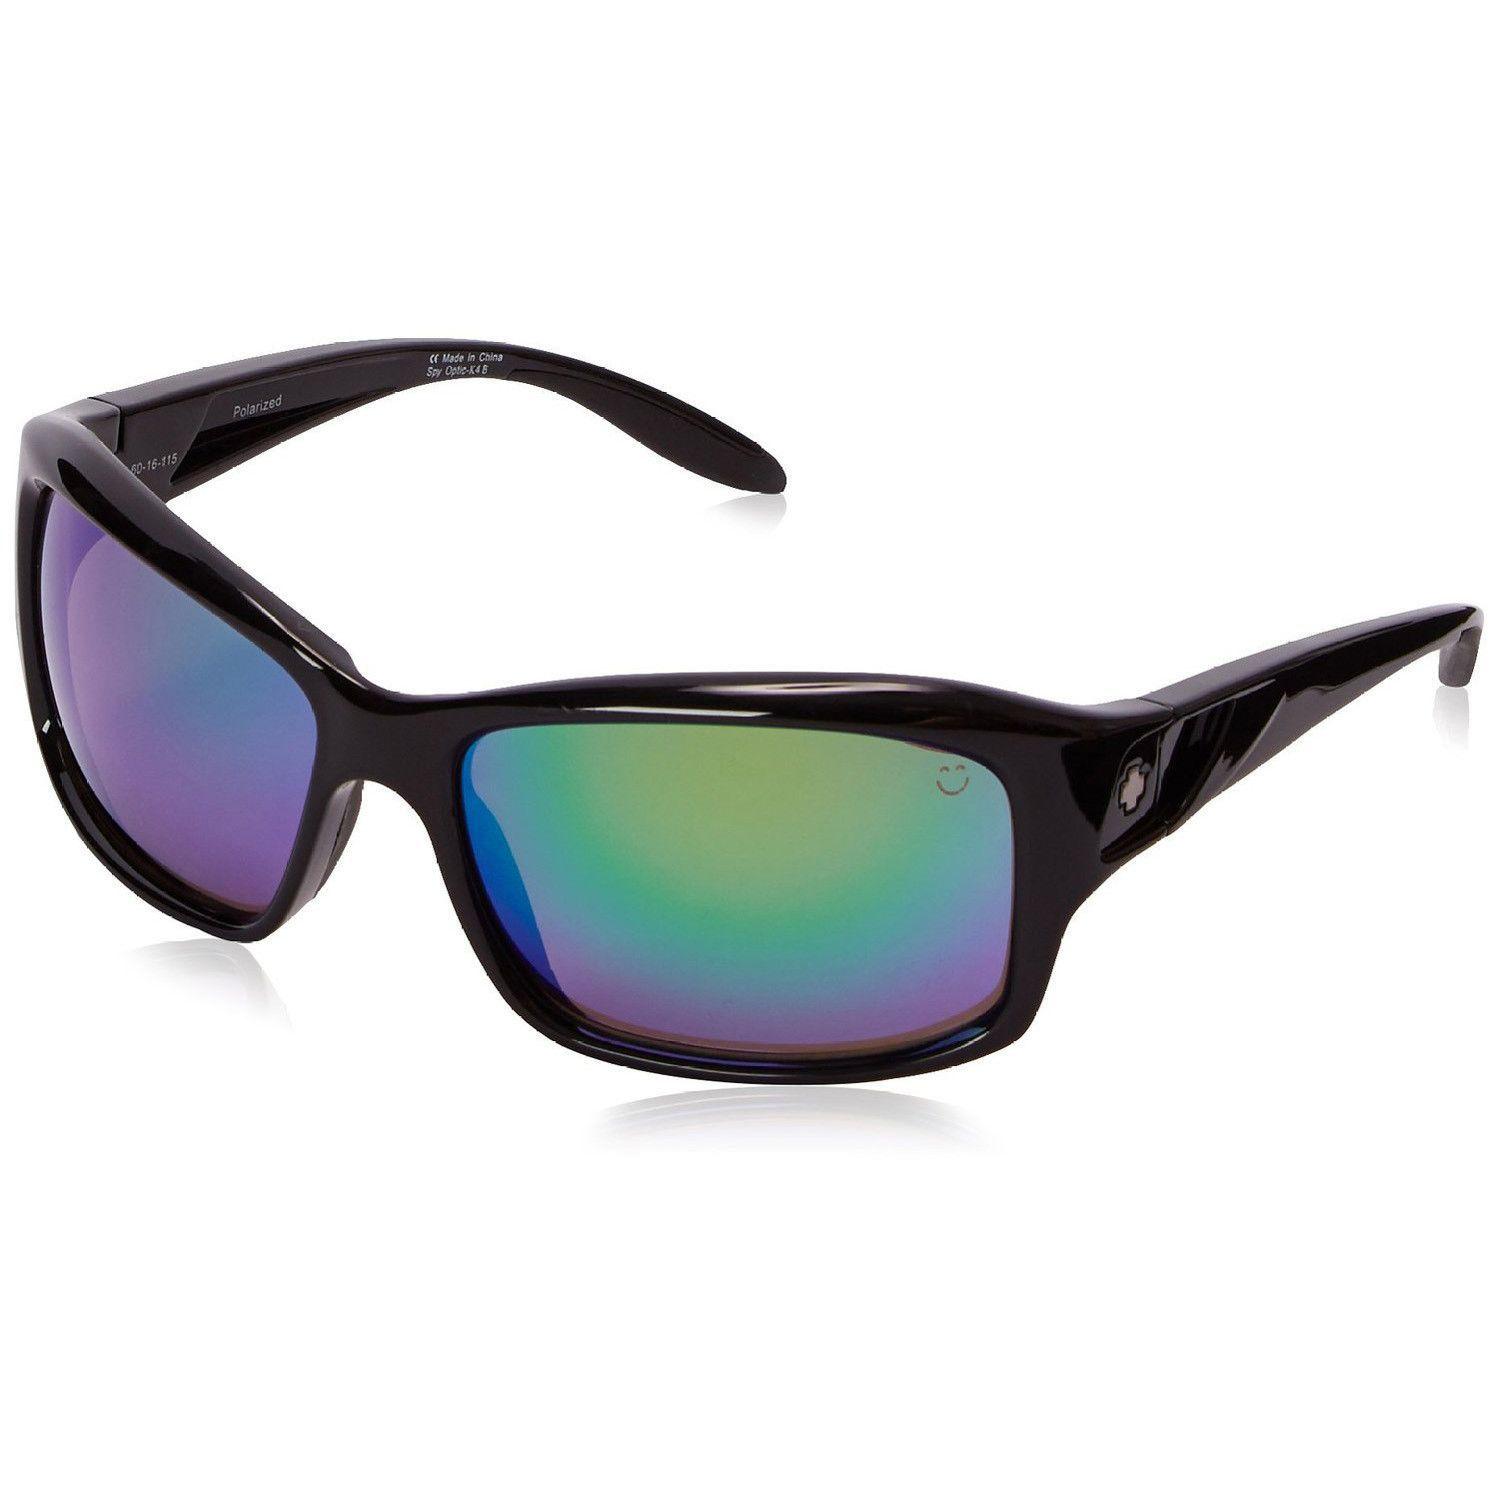 e5ced90537 Spy Optic Libra Black Frame Happy Bronze Trident Polarized Green Spectra  Mirror Lens Women s Sunglasses